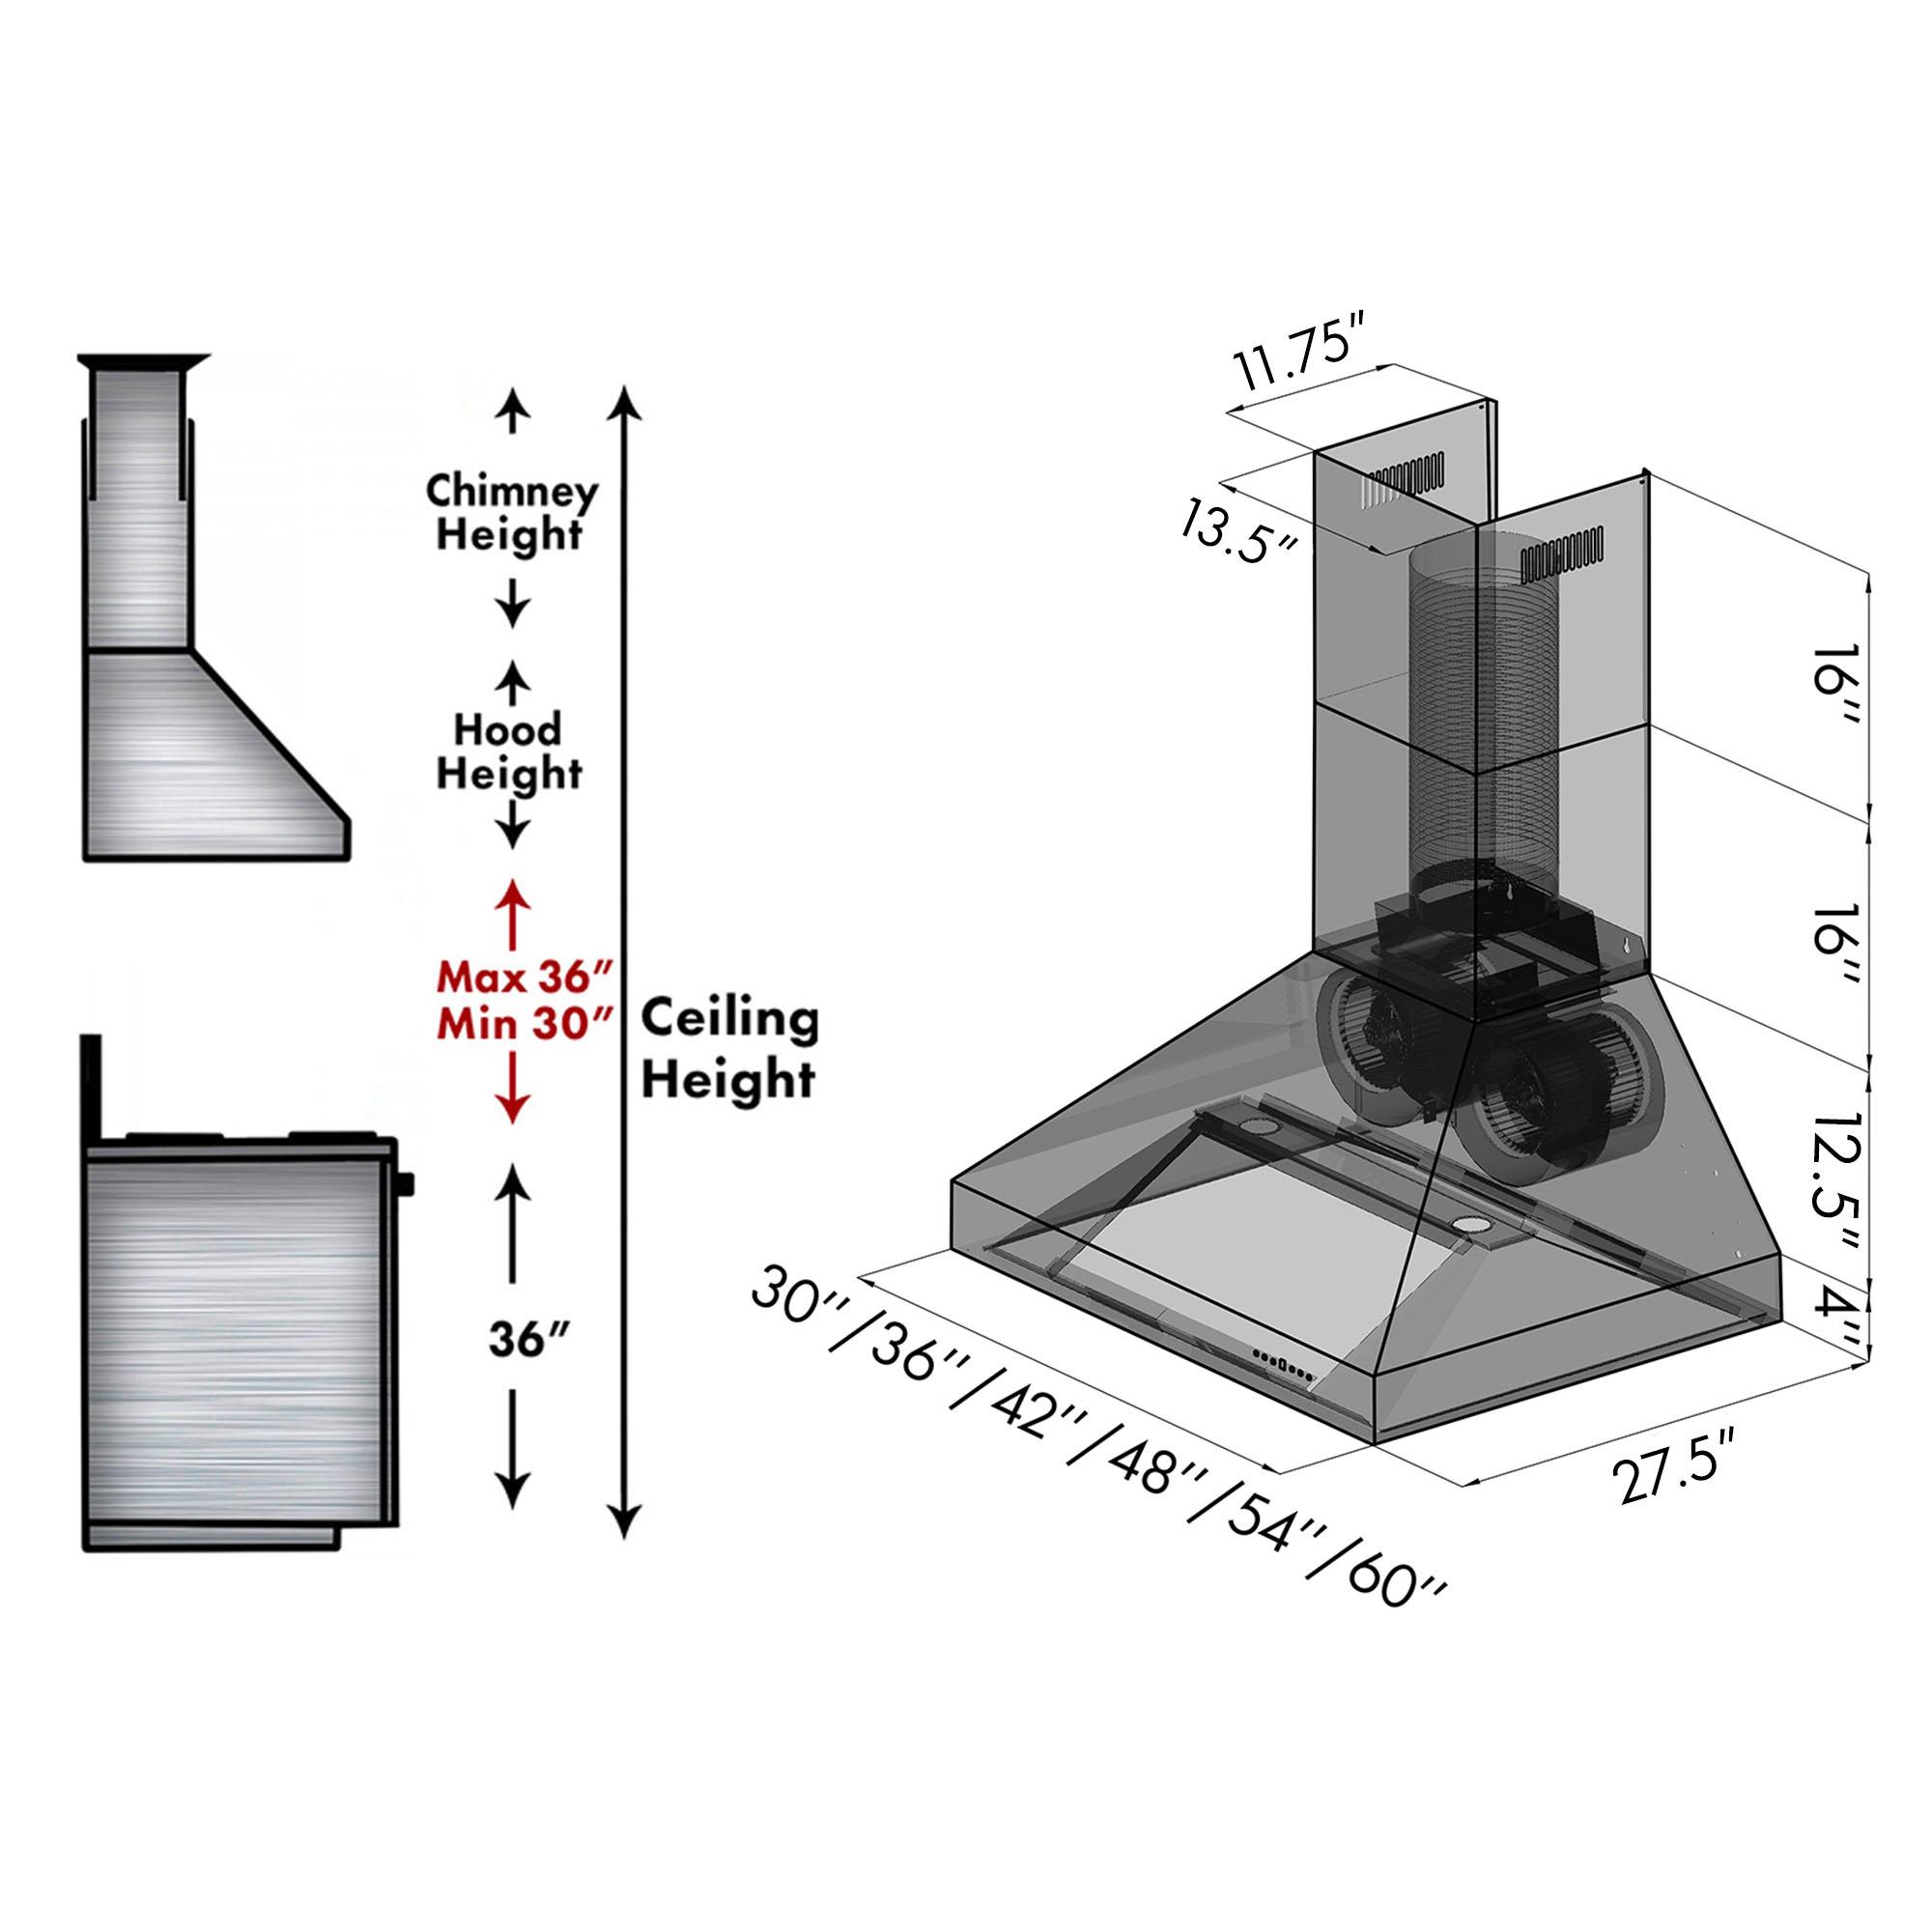 zline-stainless-steel-wall-mounted-range-hood-697-graphic.jpg